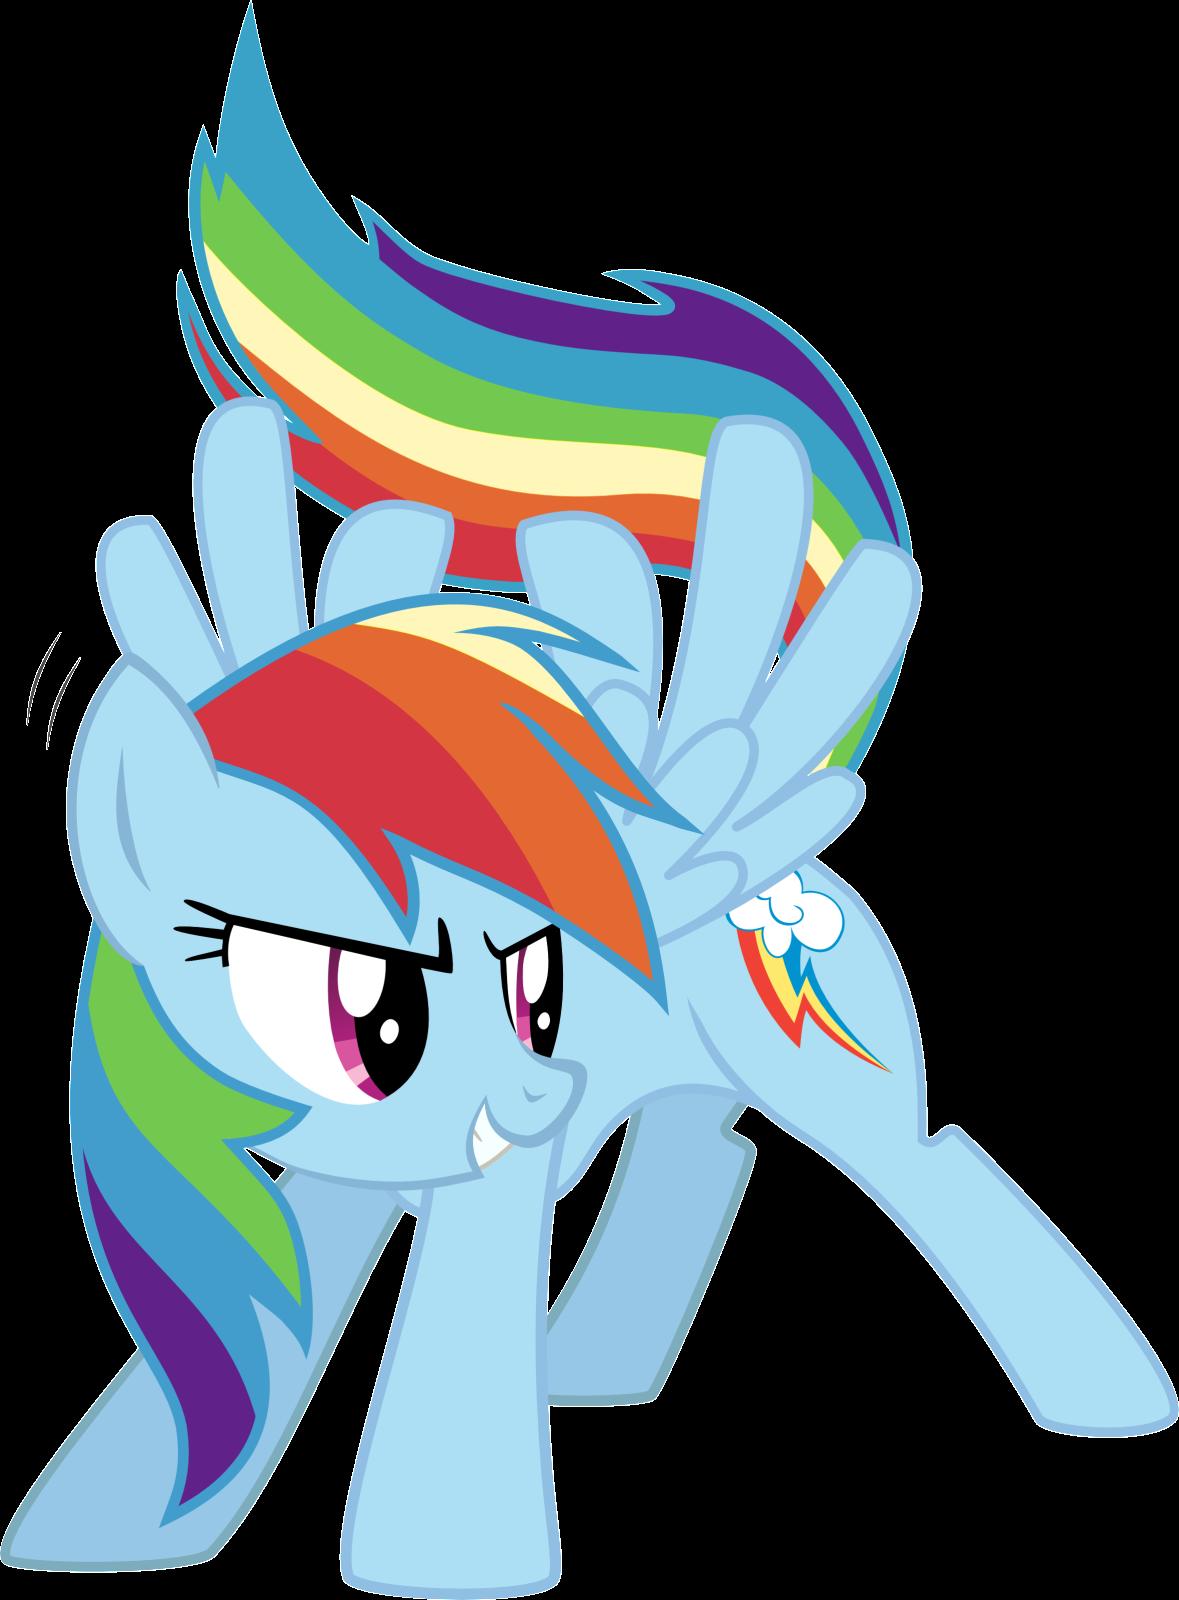 my little pony friendship is magic desember 2013